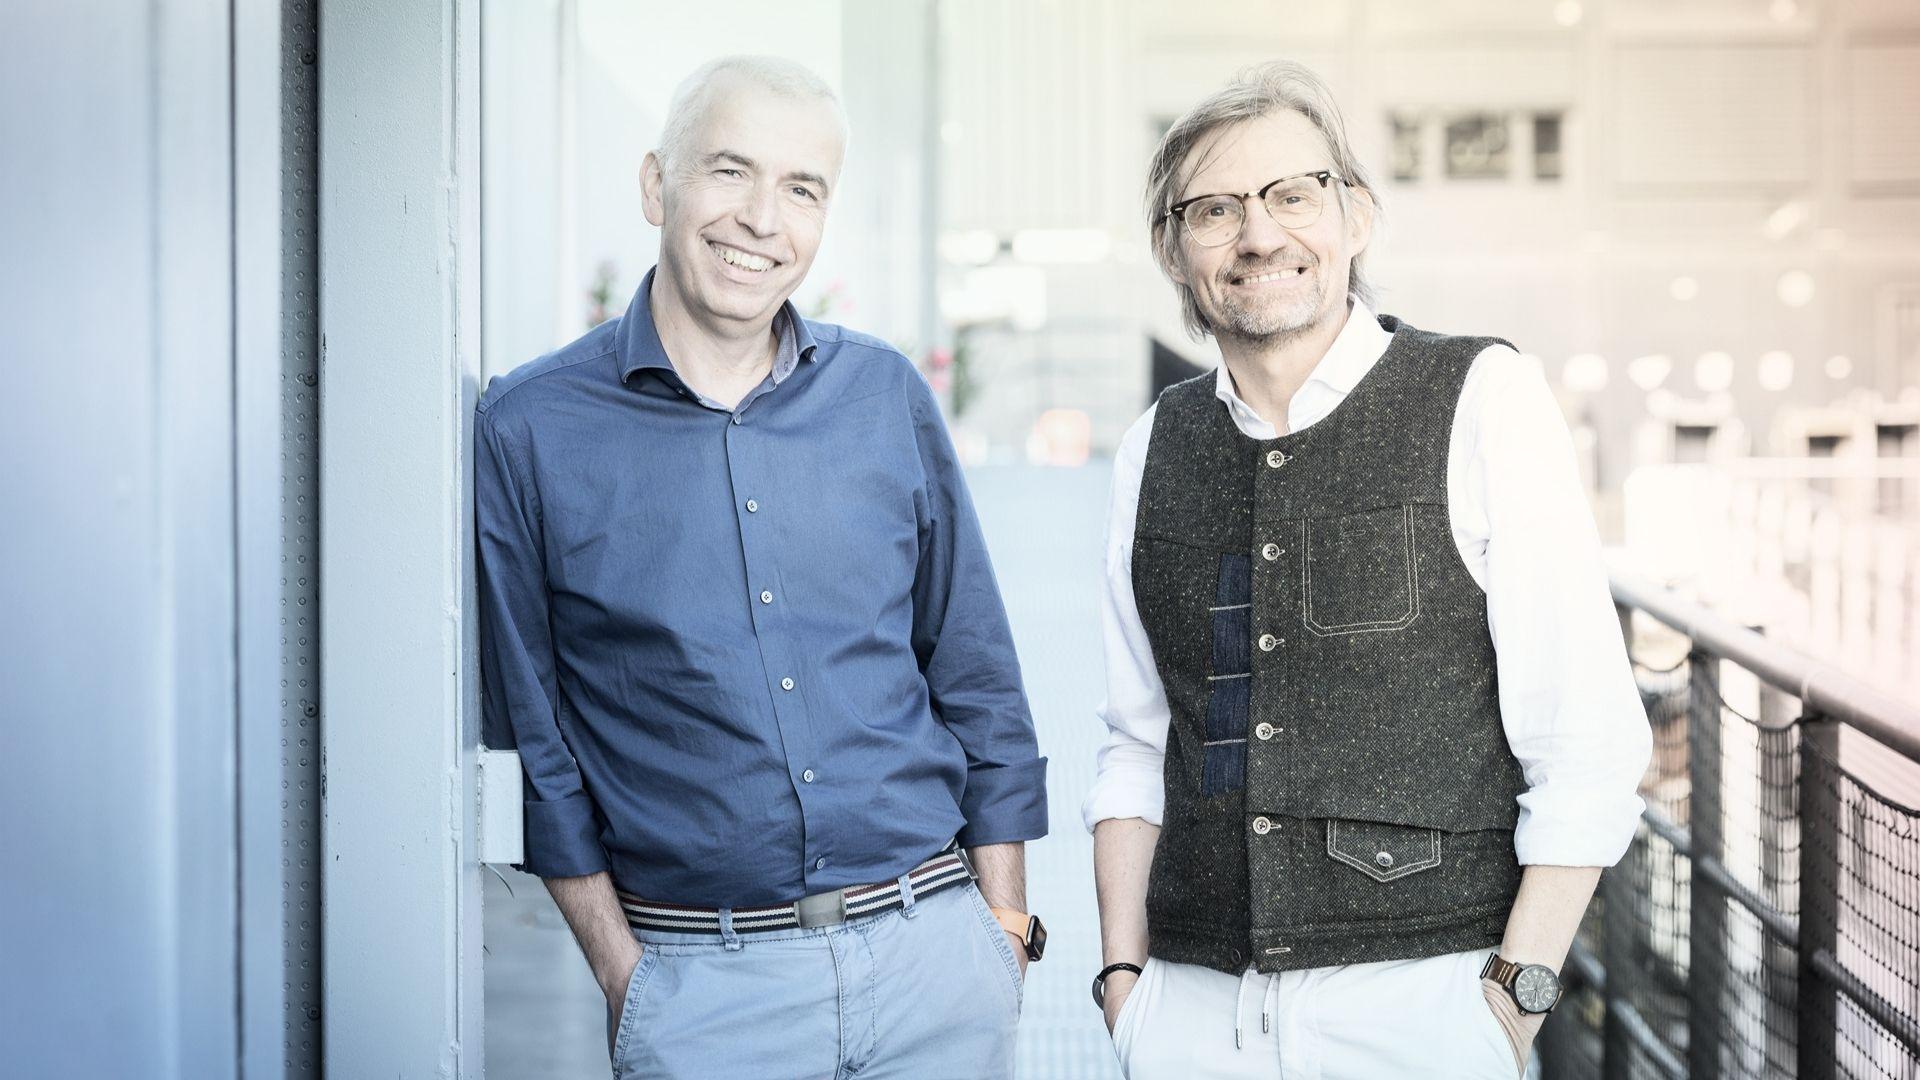 Olav Strawe (l) und Ralf Mühlenhöver (r)